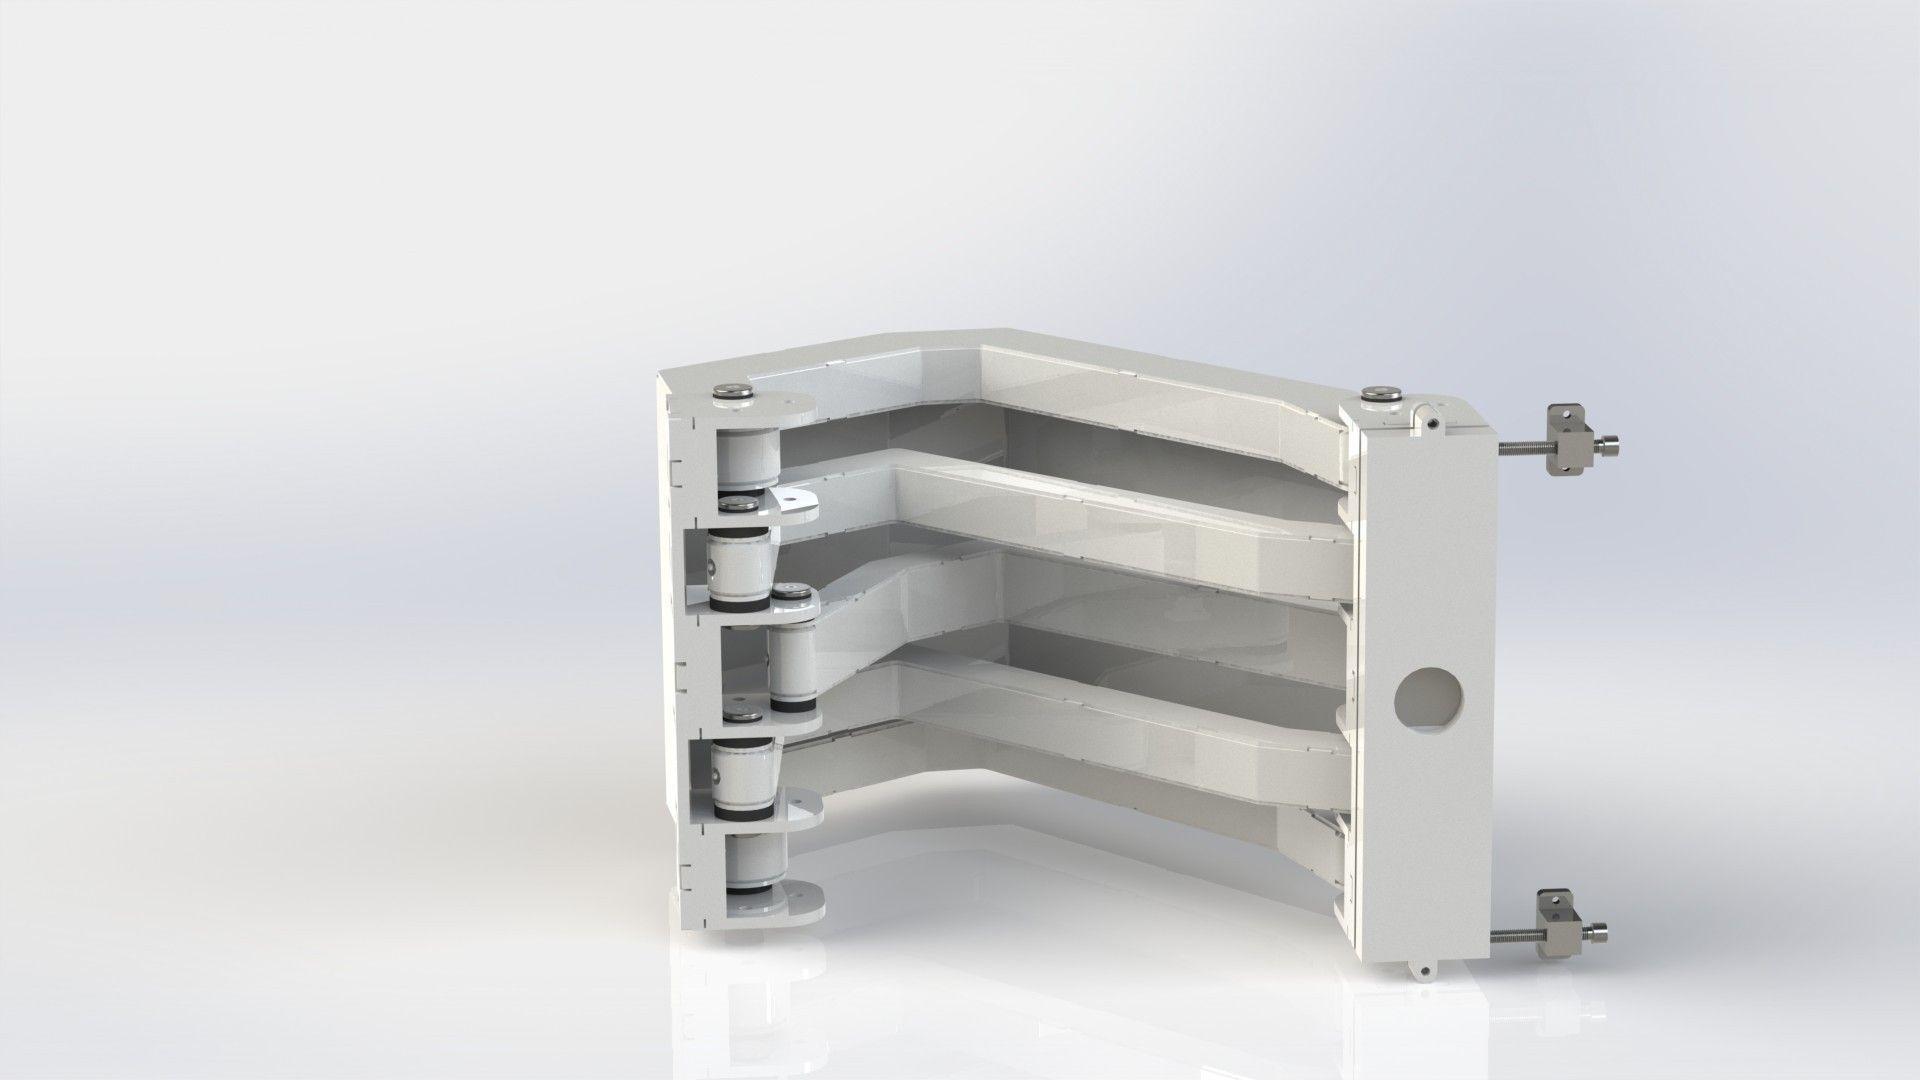 marine pantograph hinge aisi 316 satin finish 3d model ... & Marine Pantograph Hinge AISI 316 satin finish 3D model animated